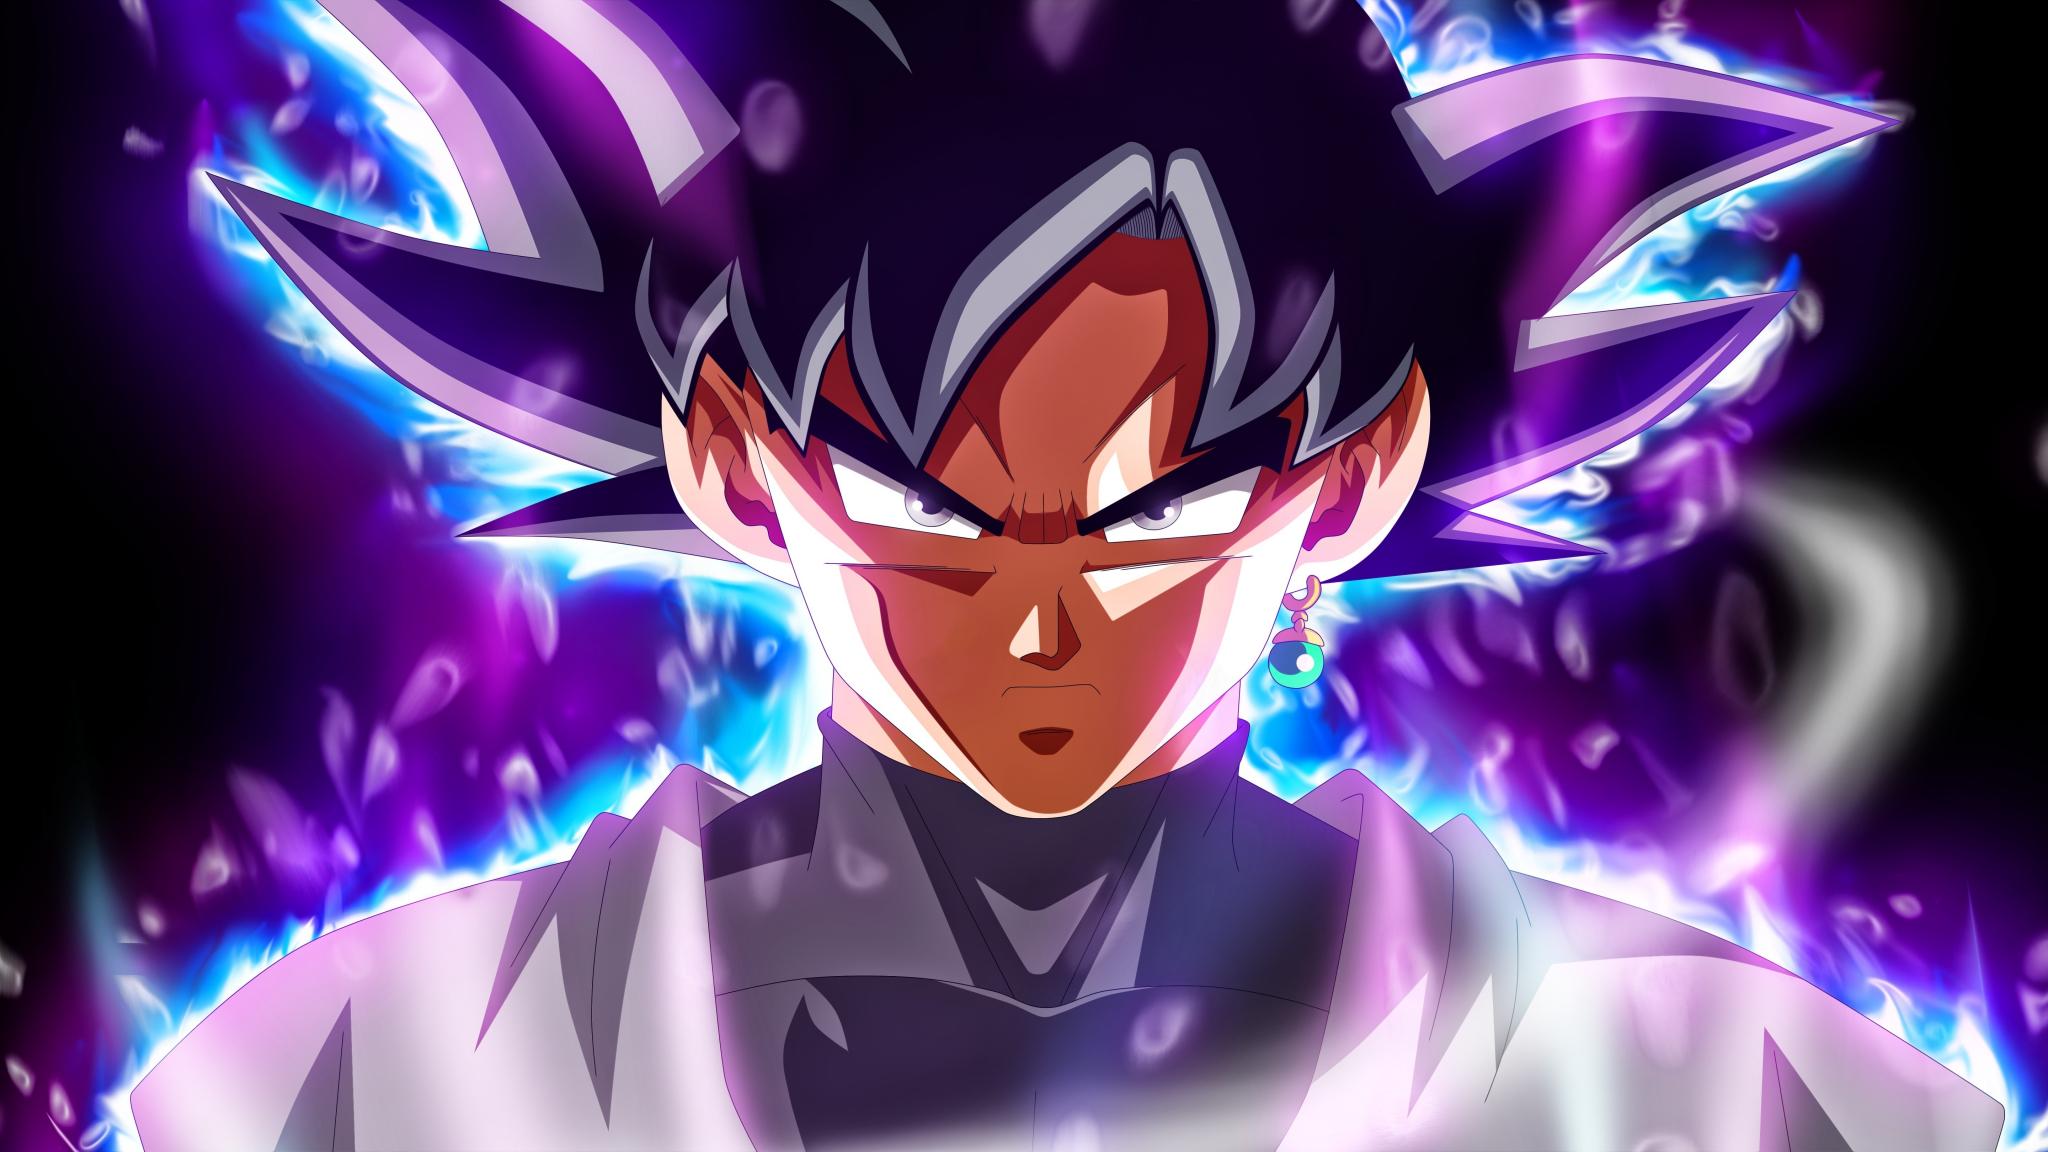 Pixels X 1080 Goku Ui 1080